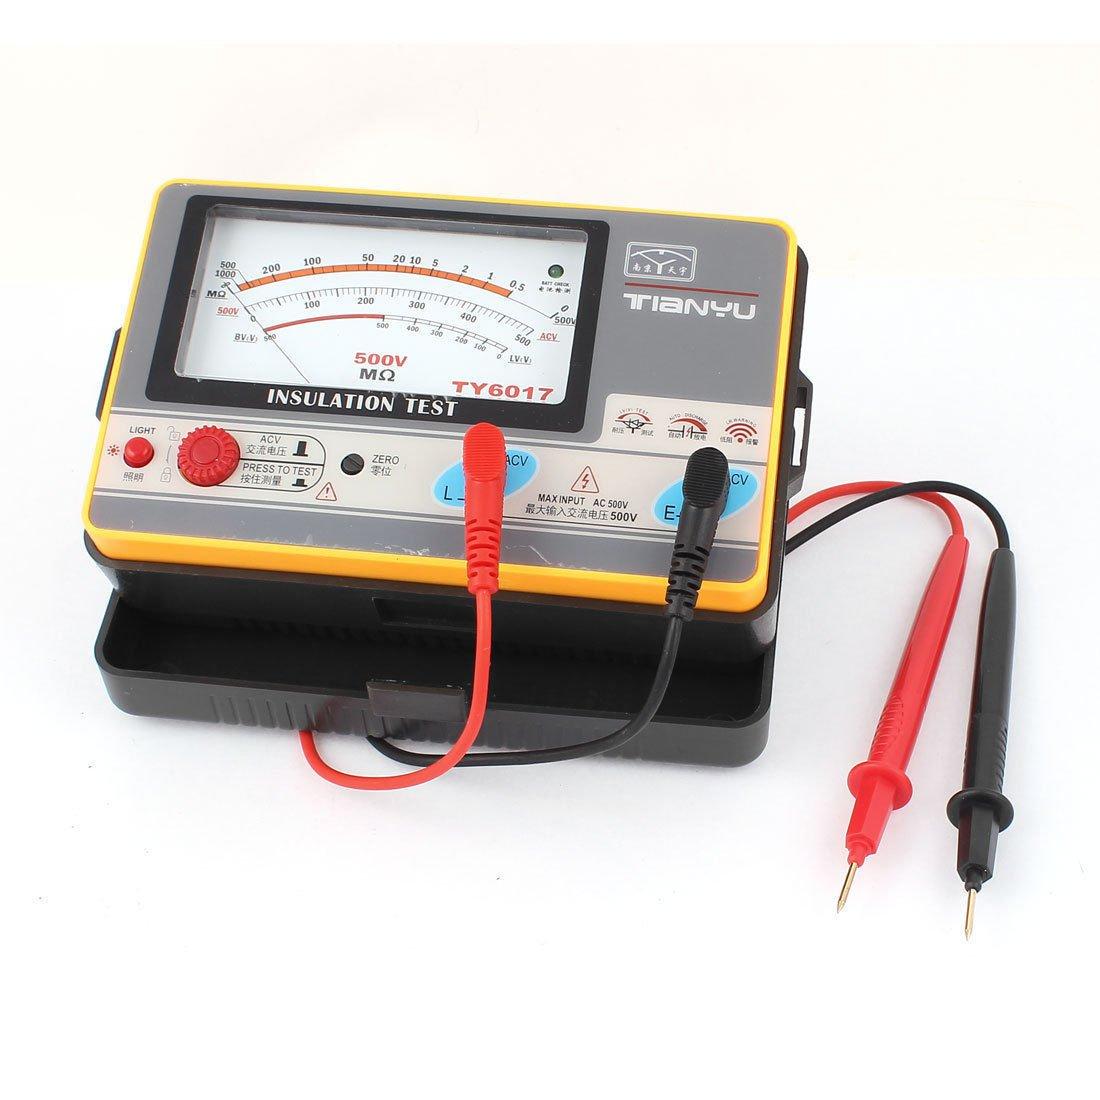 Automatic Alarm Volt Measurement Analog Insulation Resistance Tester TY6017